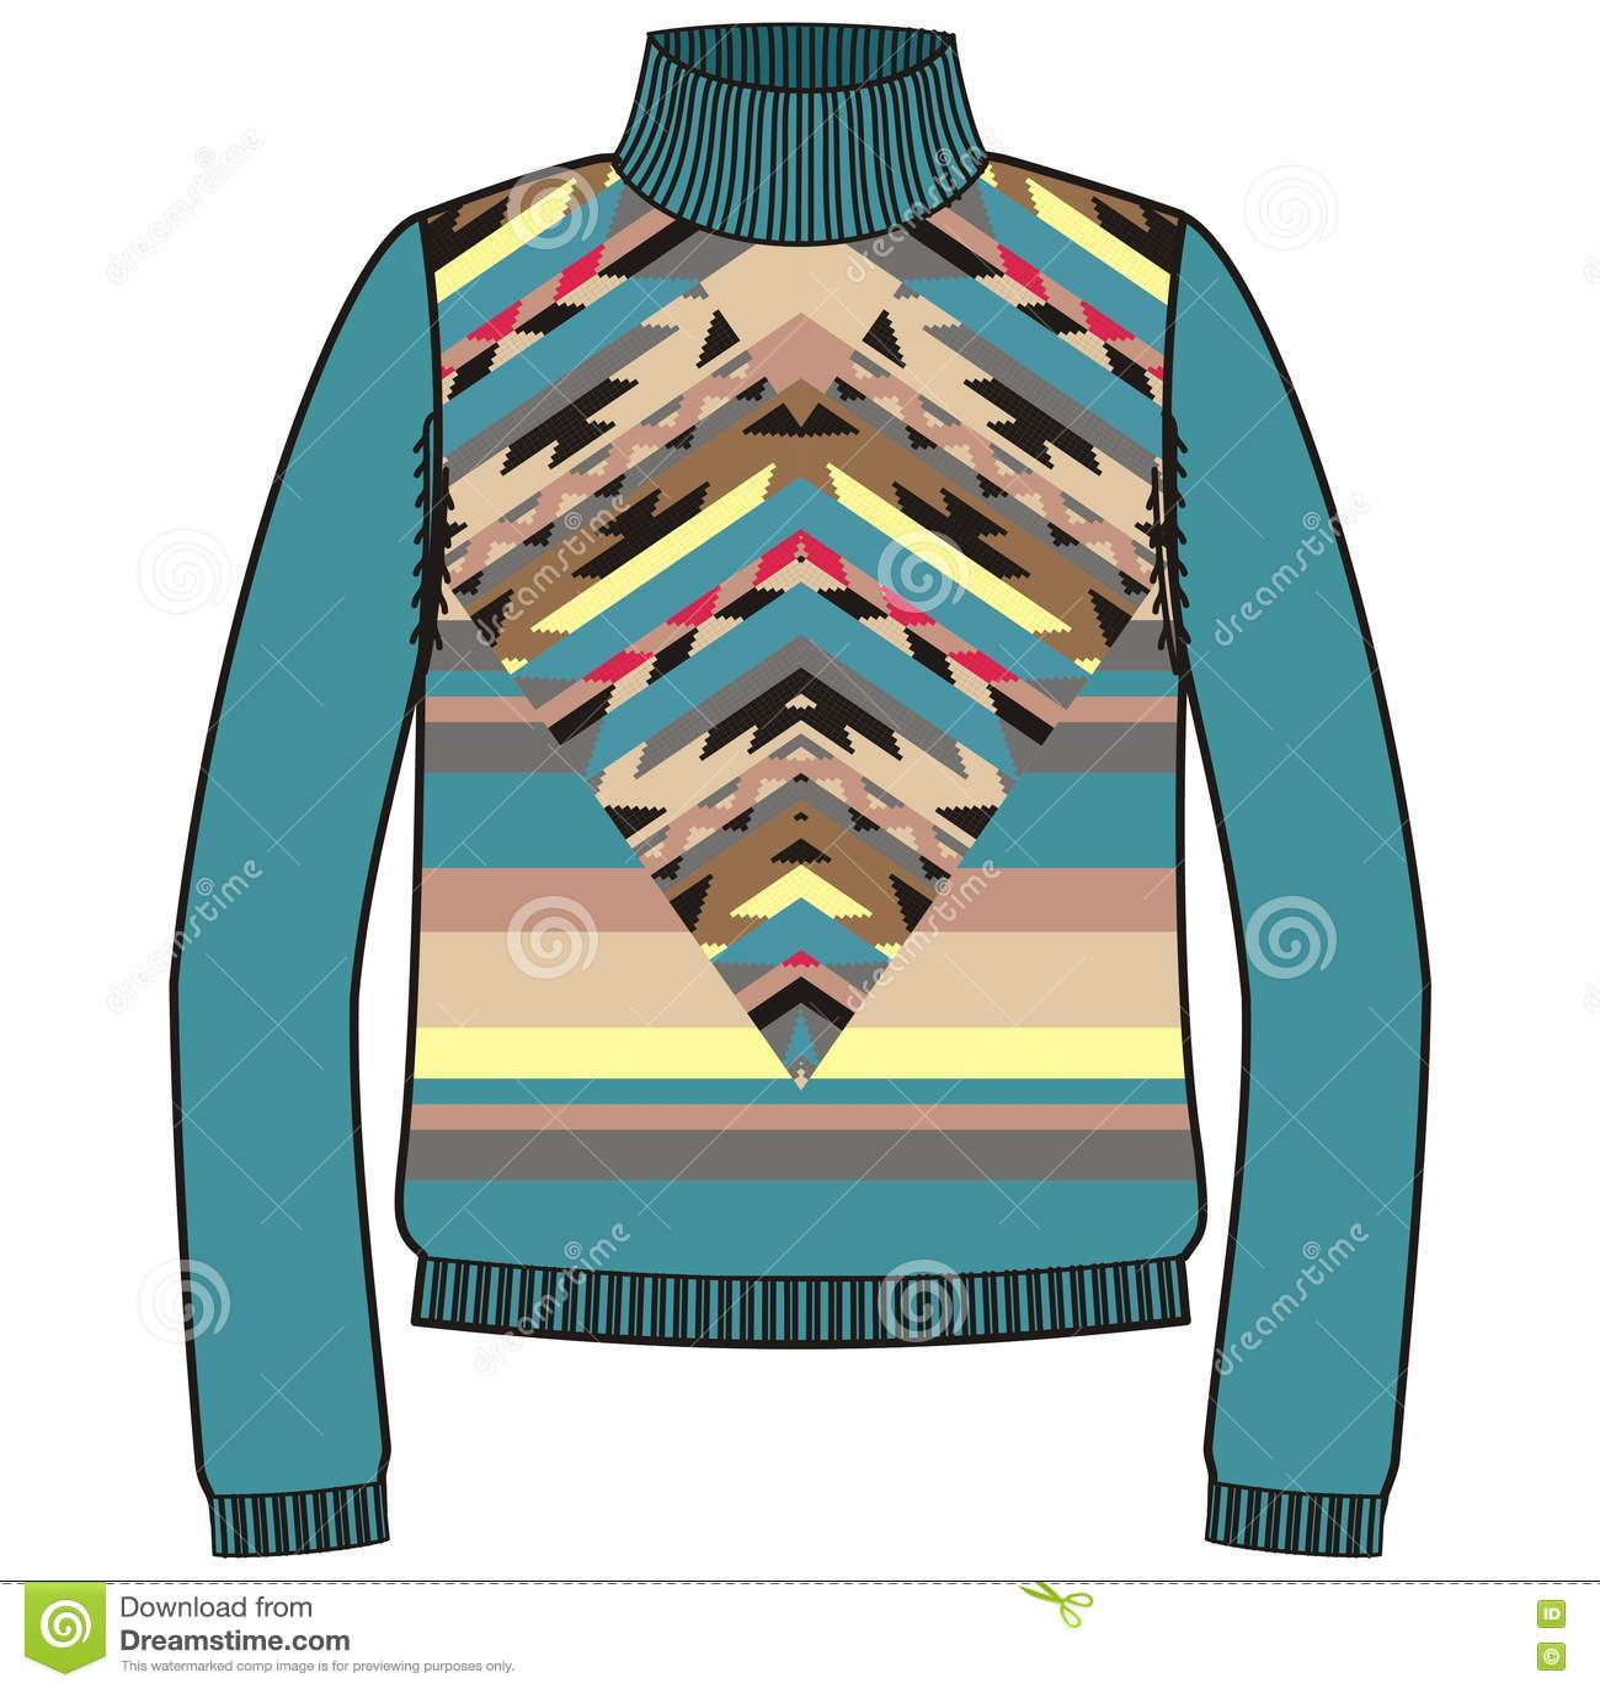 976d3722a576f3 Winter Warm Tribal Jumper For Knit Handmade Native American Navajo ...